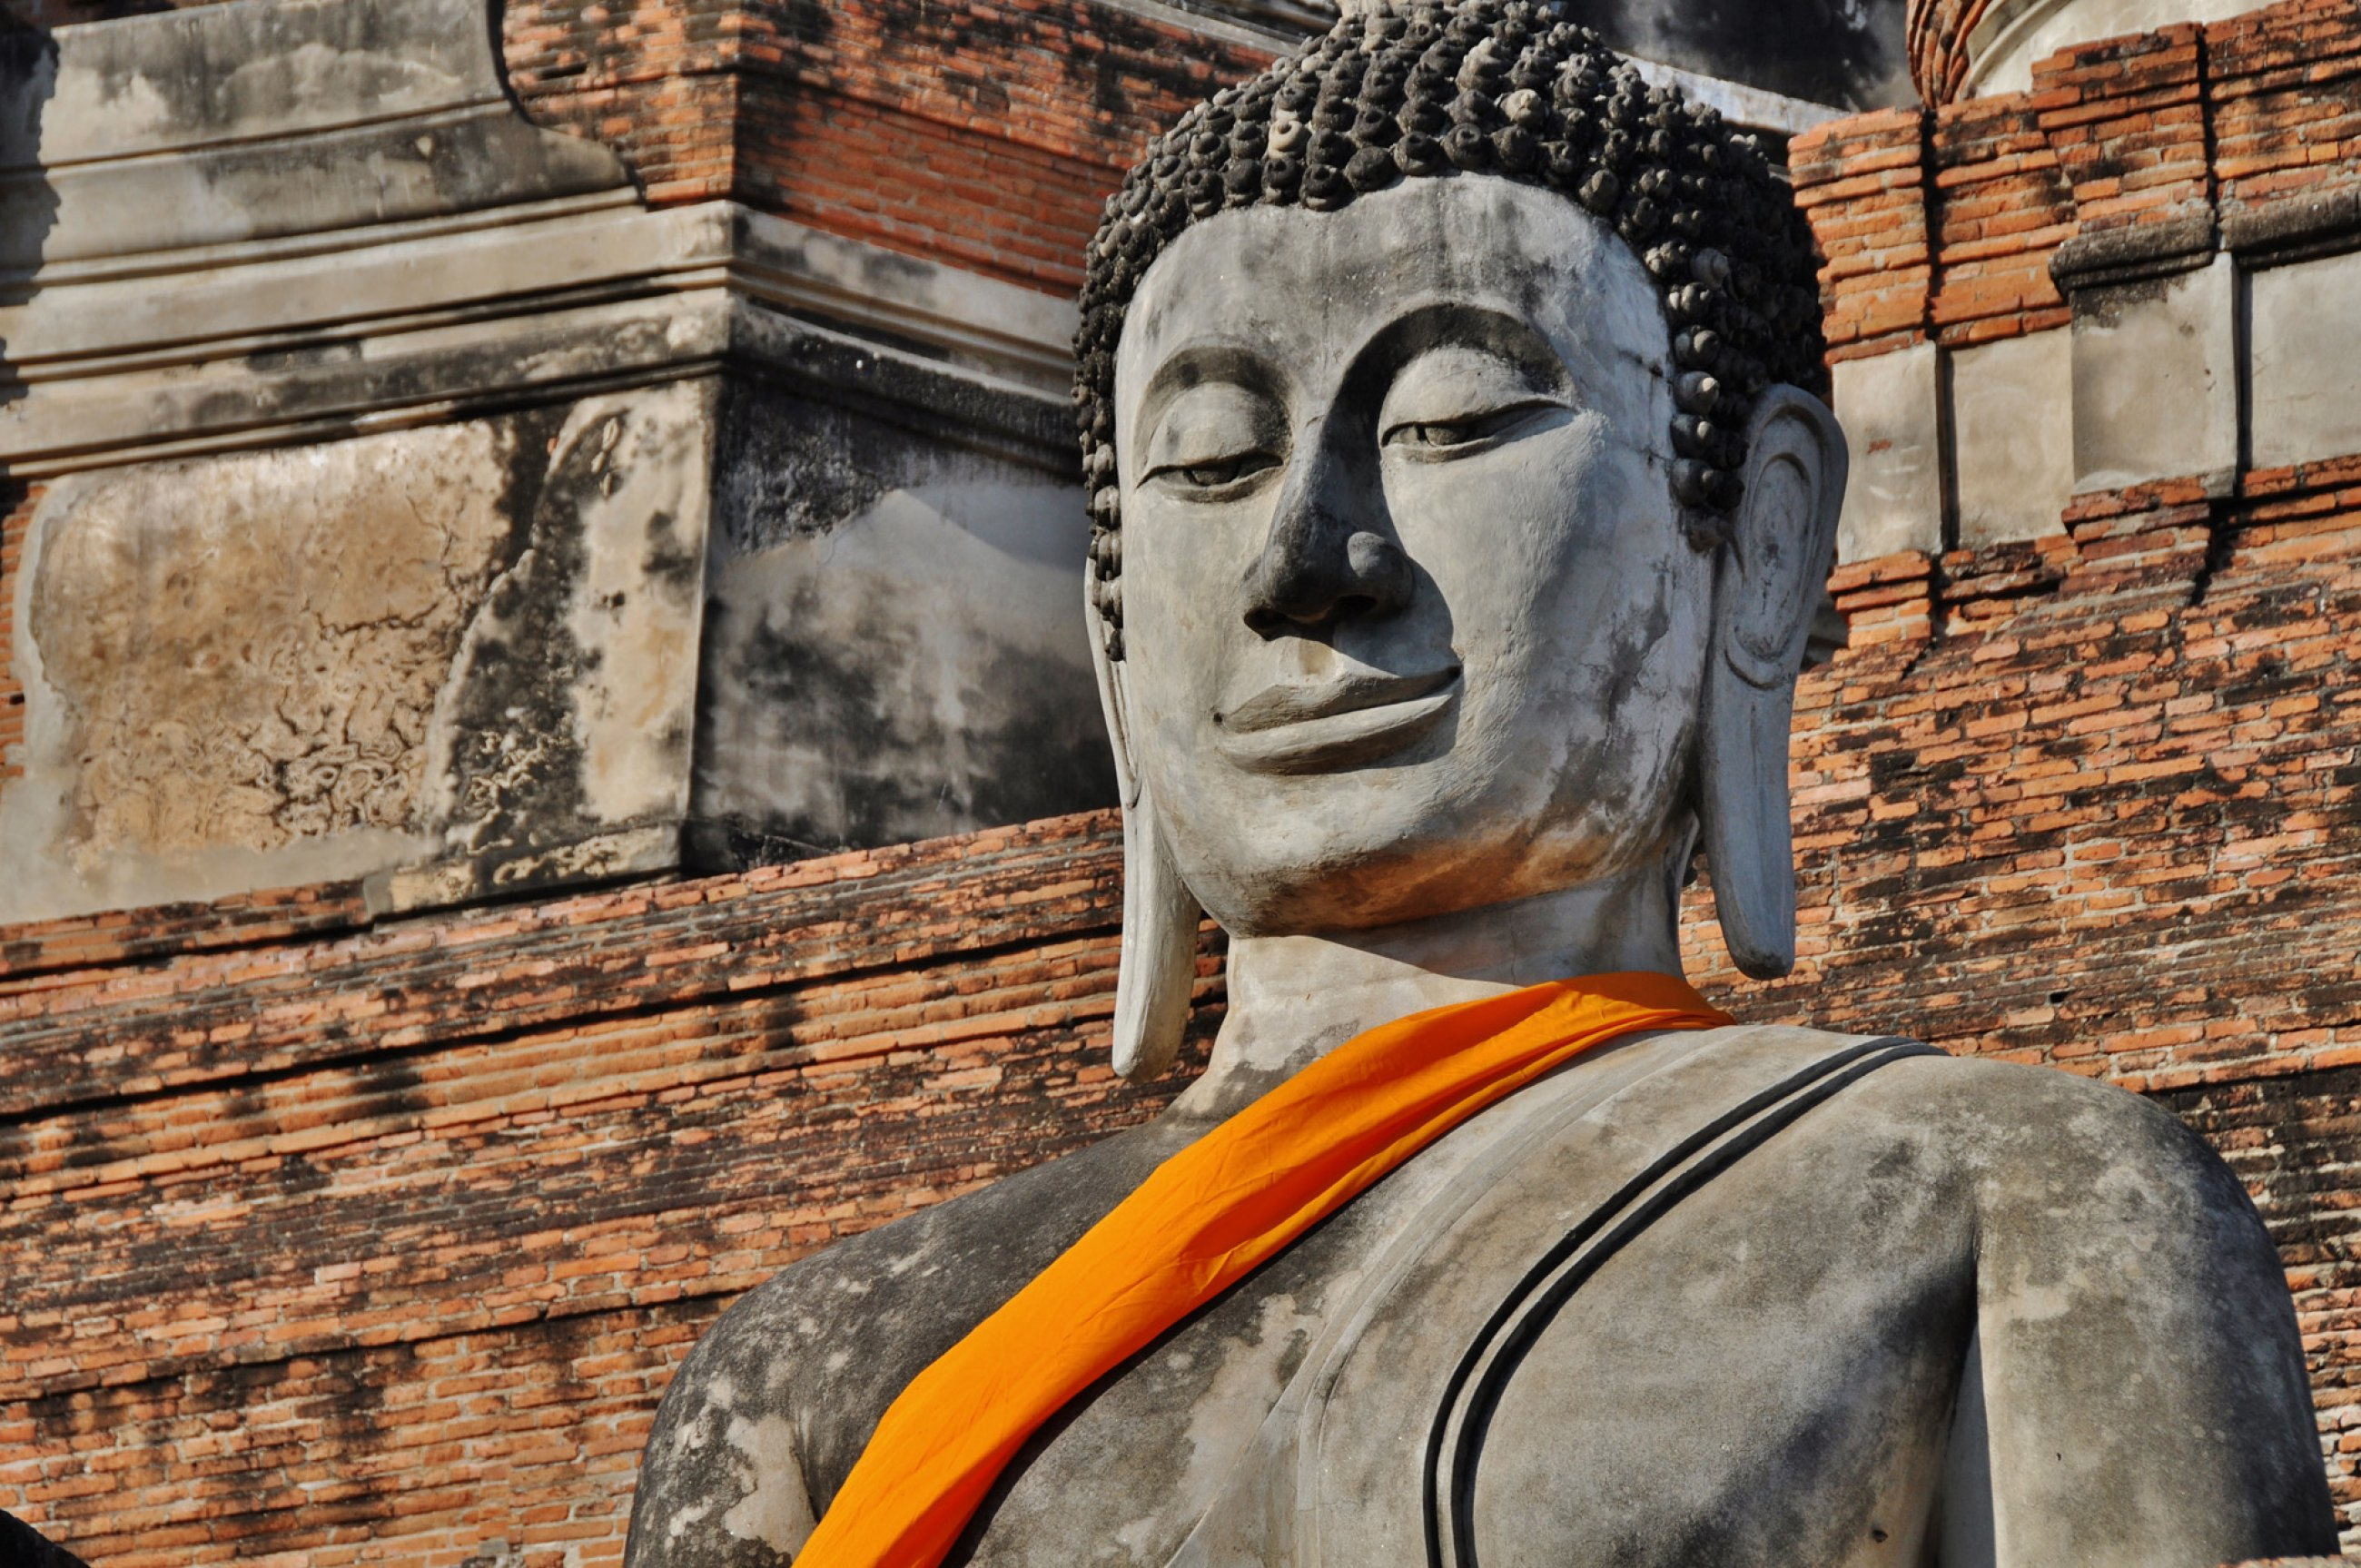 https://bubo.sk/uploads/galleries/7404/bkk-ayutthaya-tomas-kubus-2014-3-.jpg